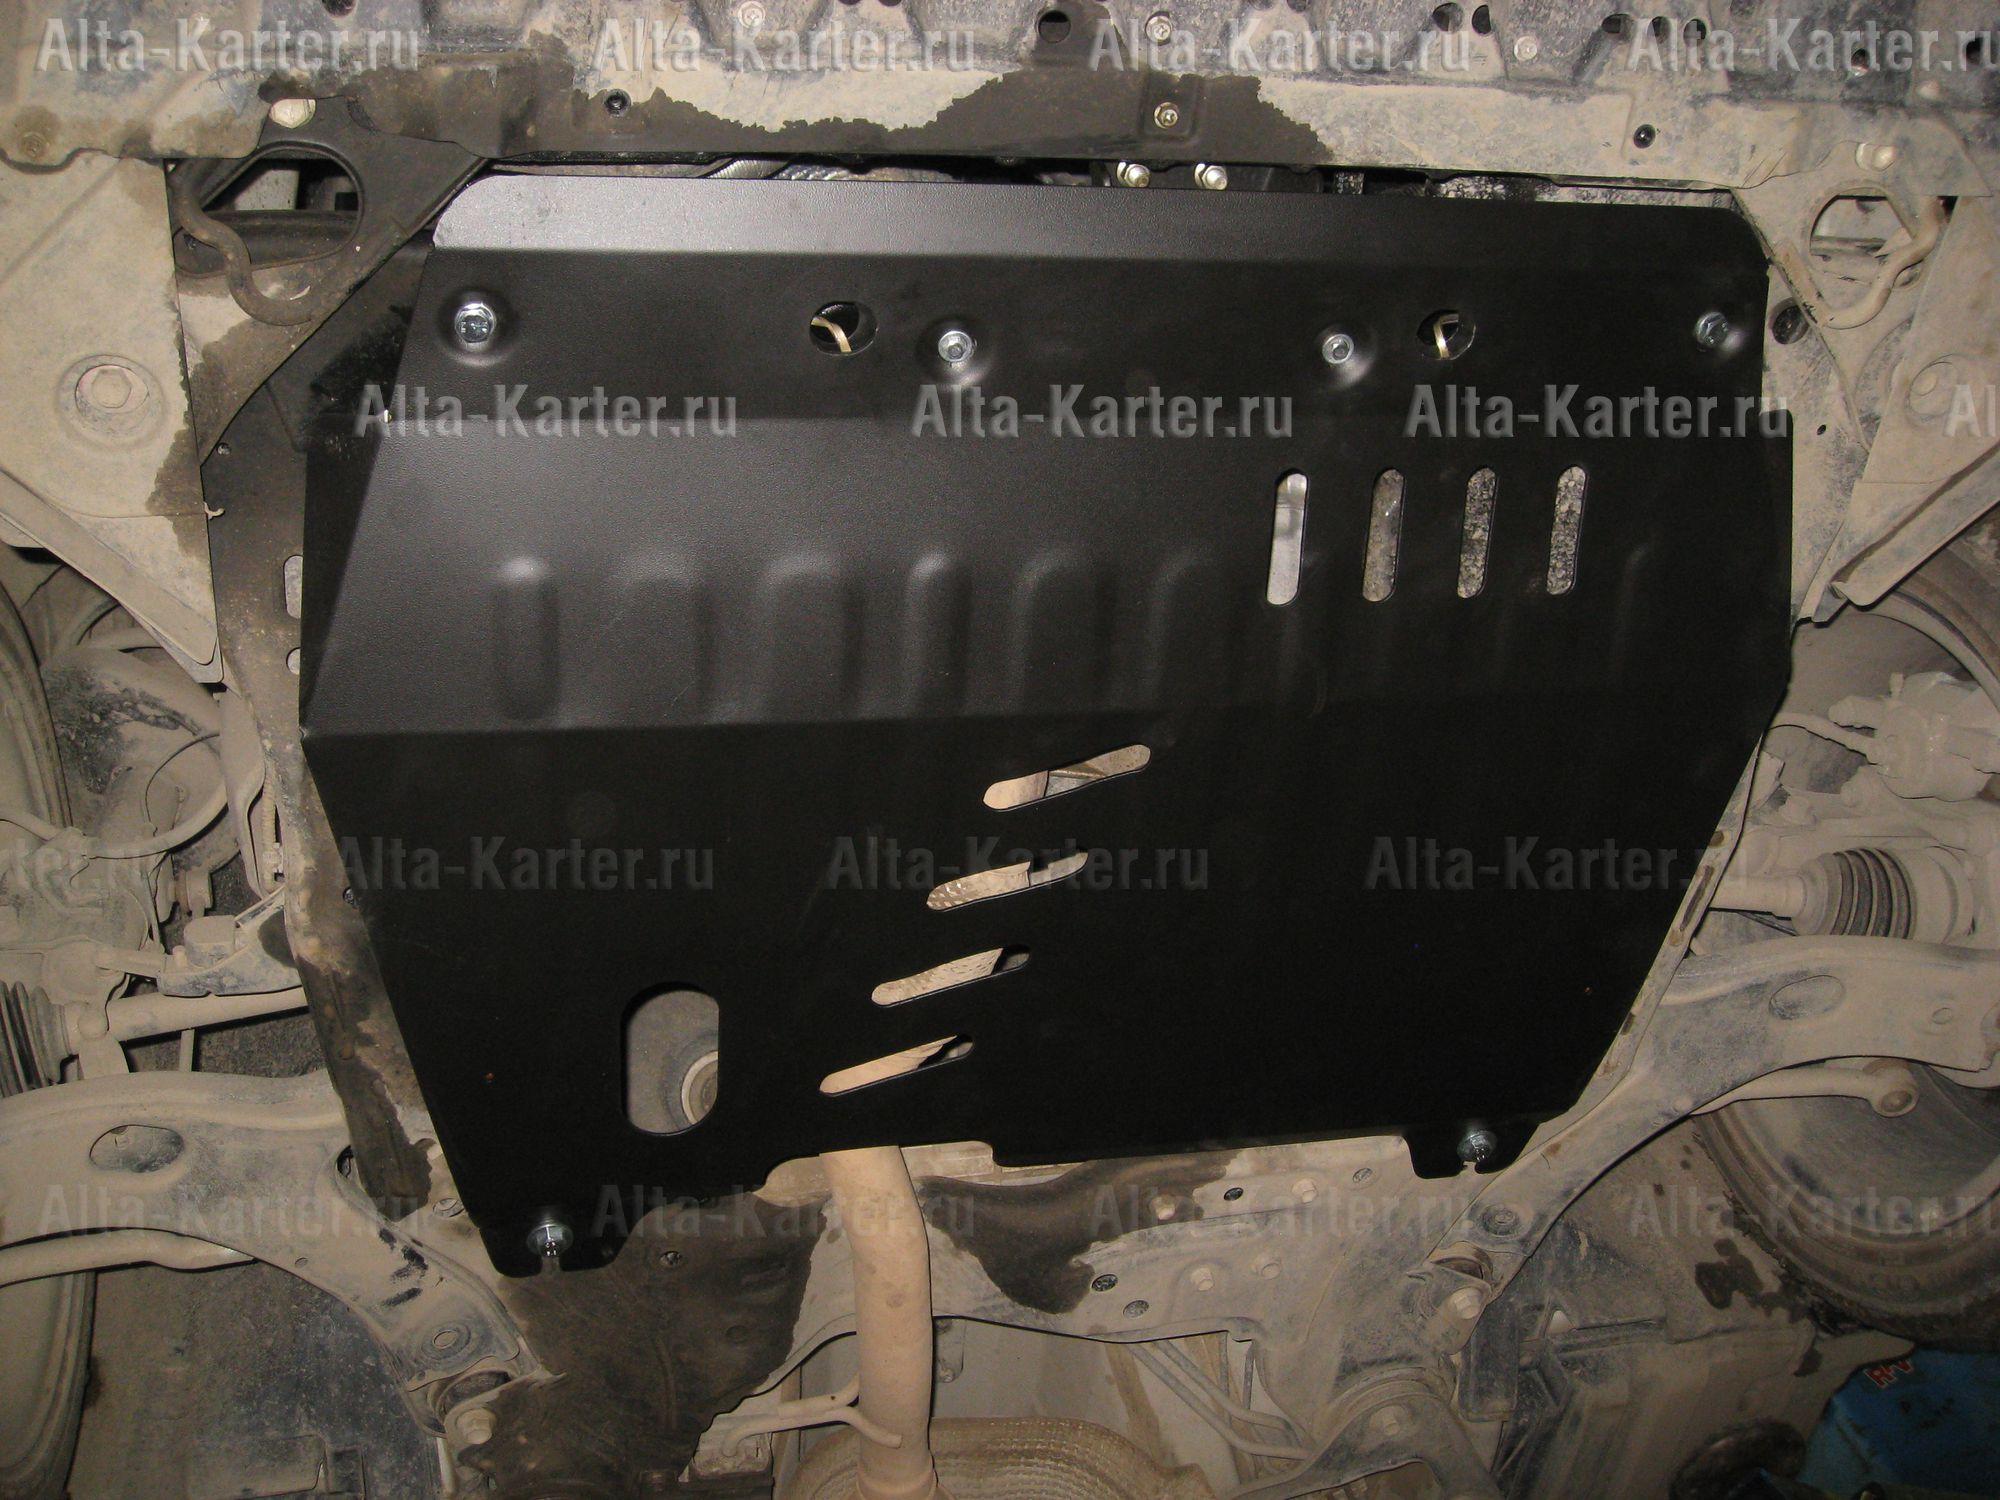 Защита Alfeco для картера и КПП Suzuki Kizashi 2WD 2009-2014. Артикул ALF.23.20